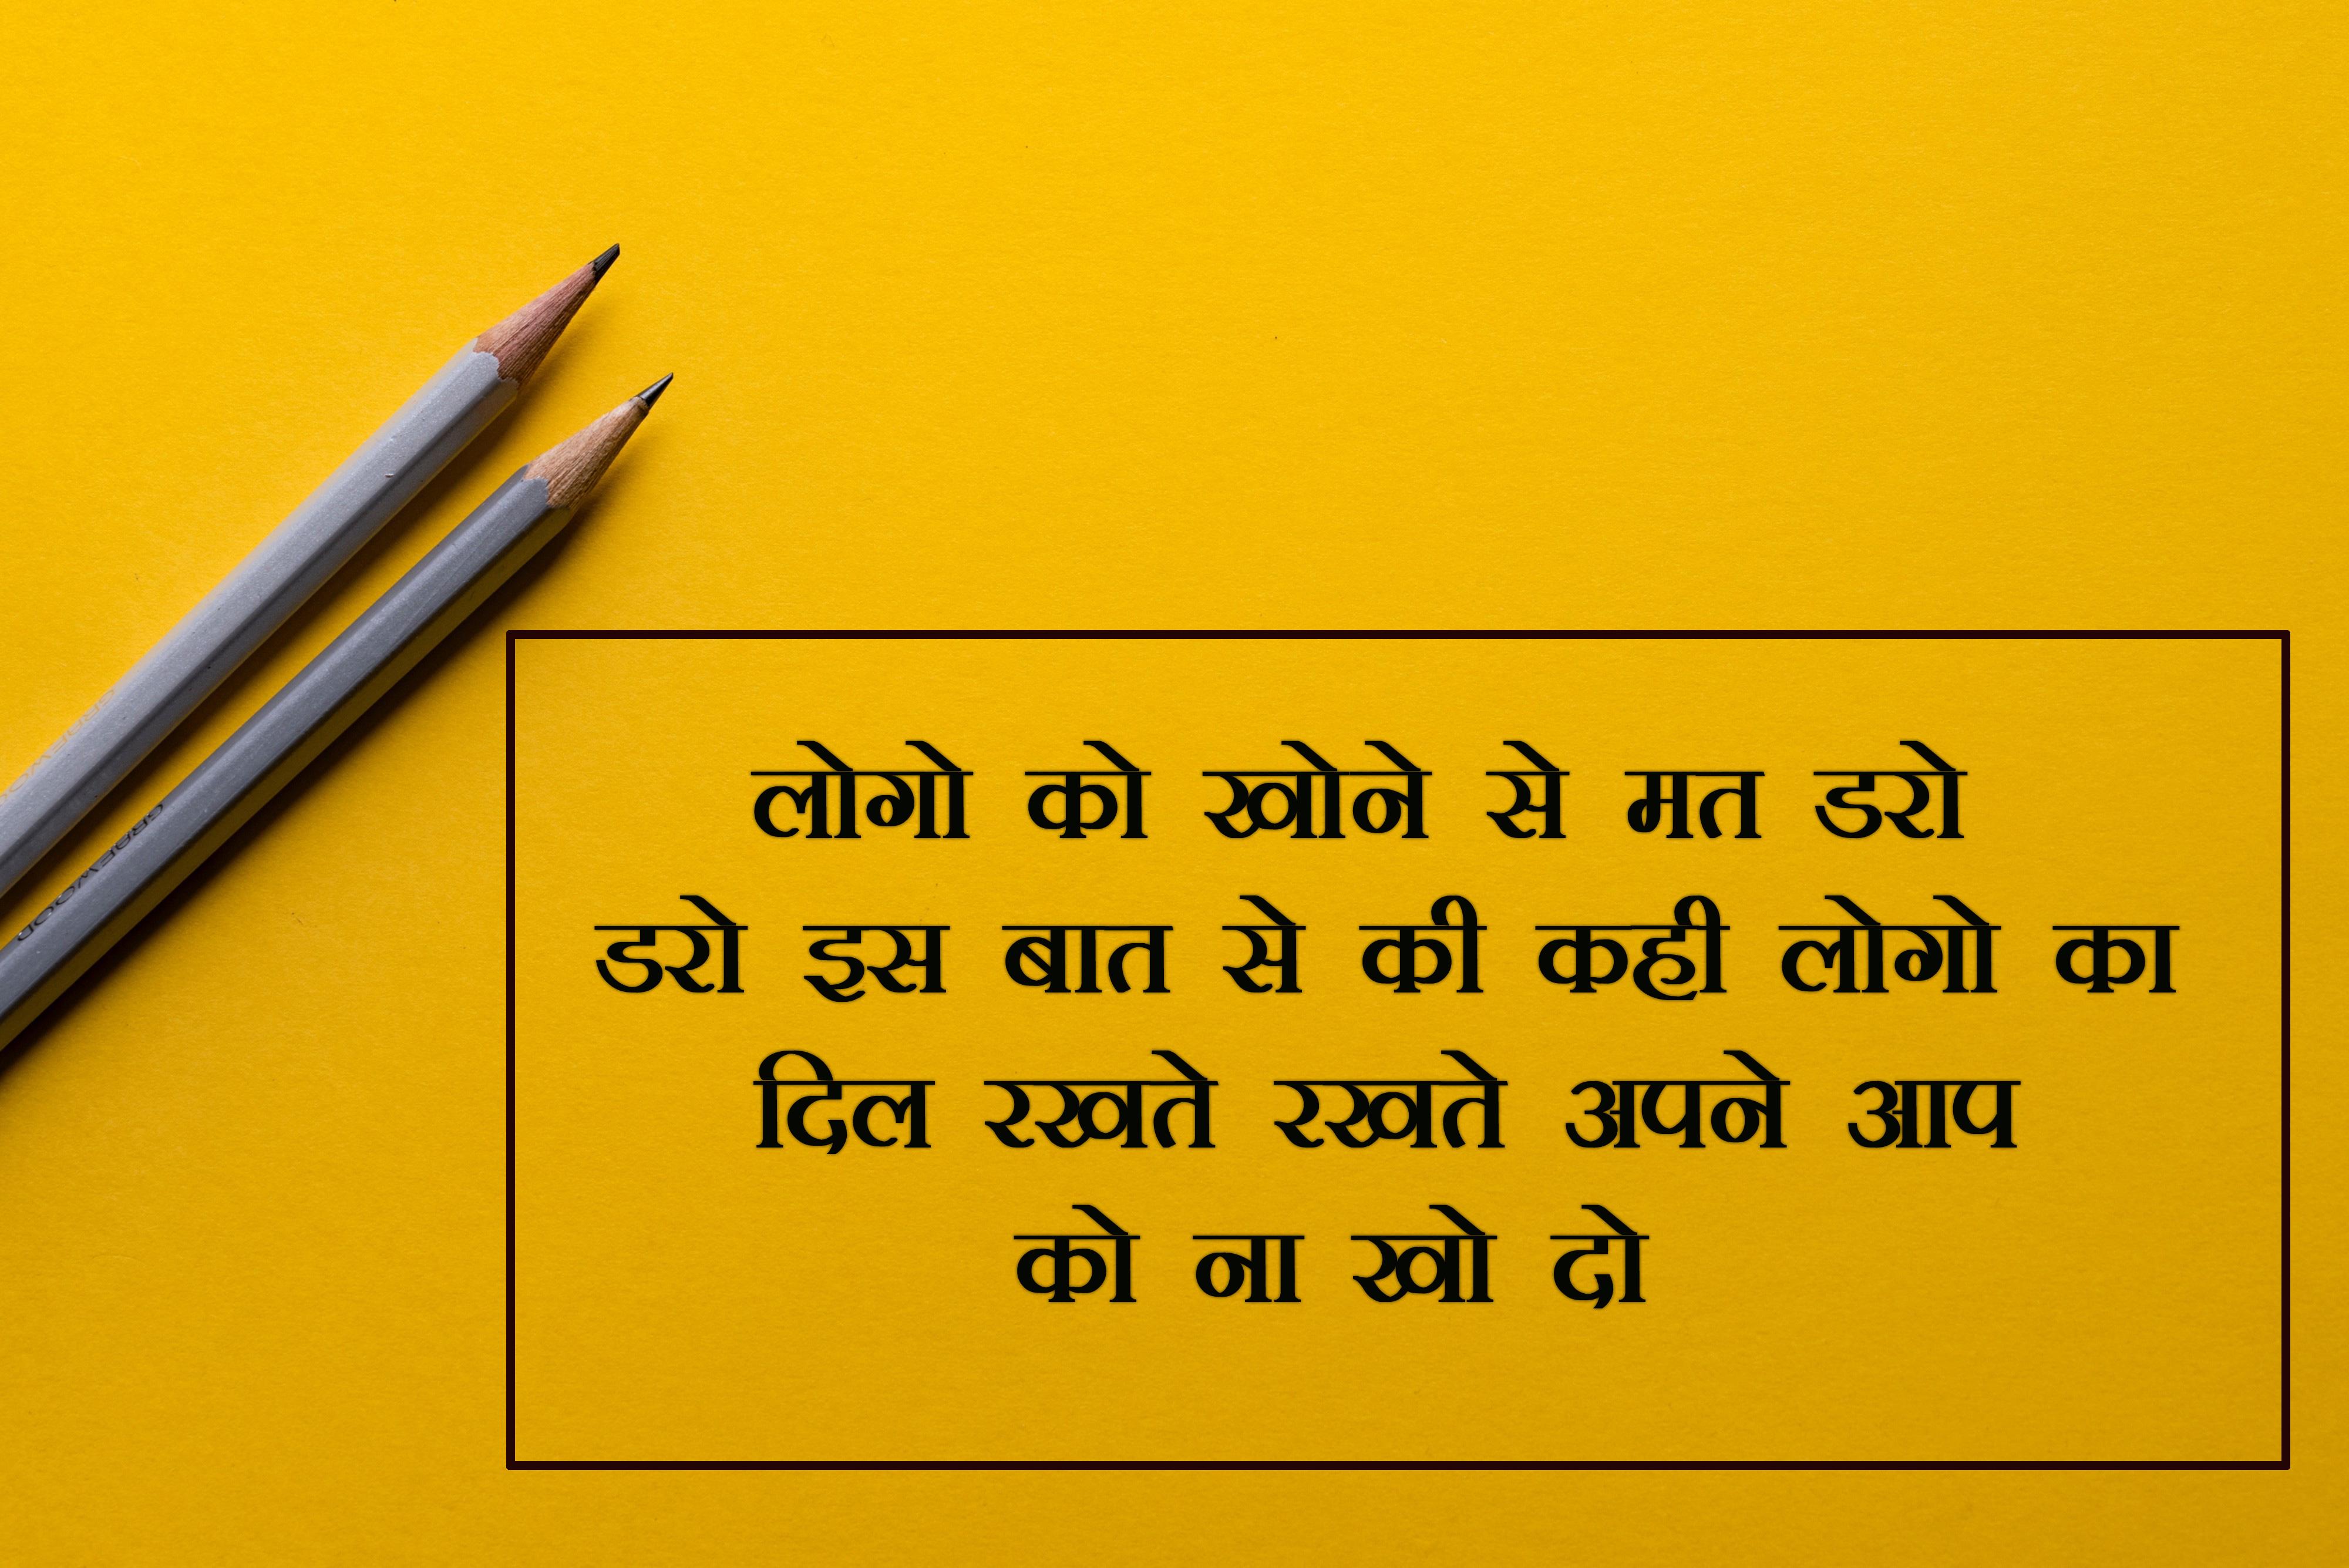 Hindi Inspirational Images Wallpaper Free 2